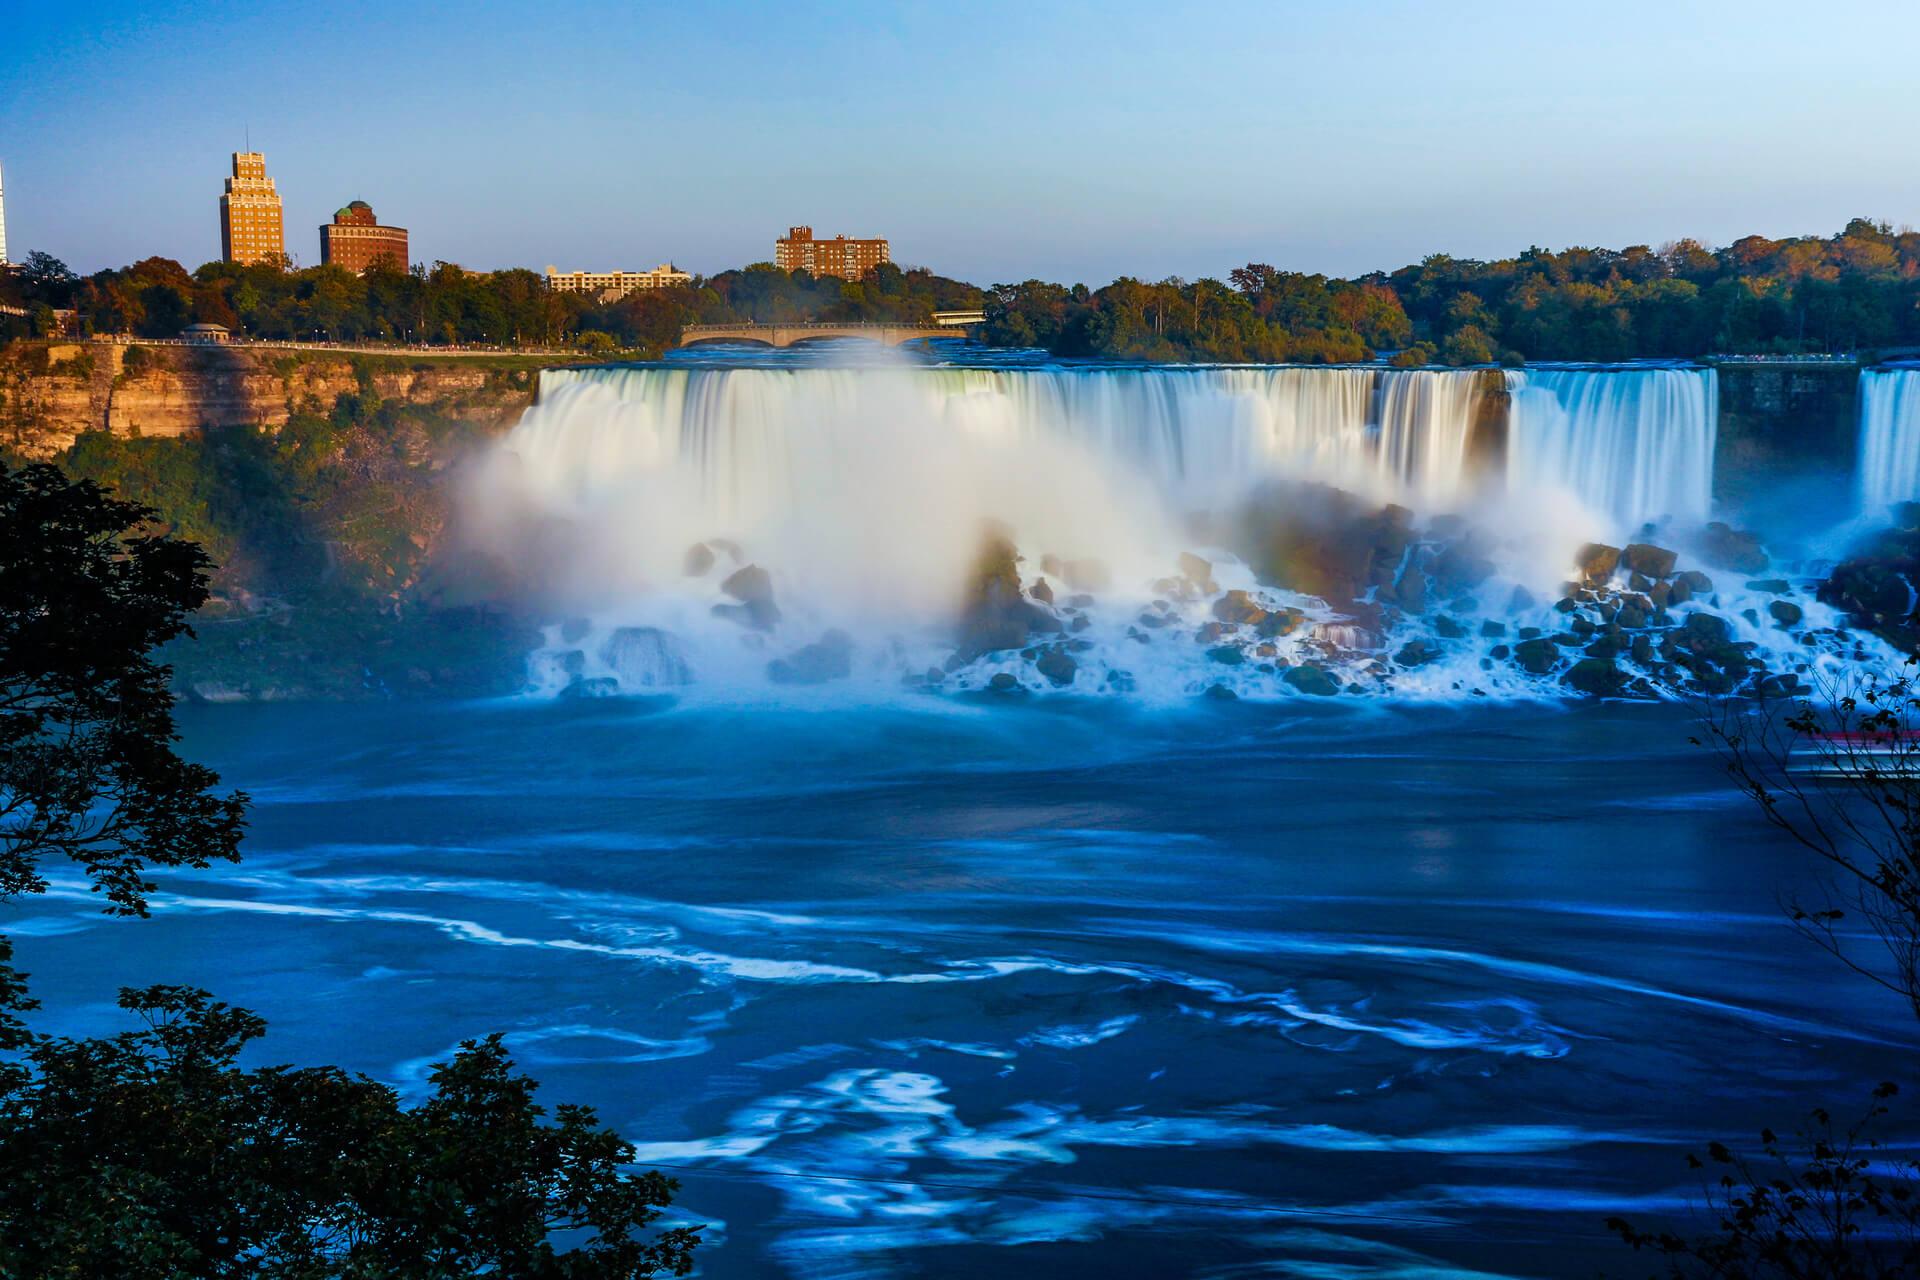 Fantastic views of the Niagara Falls, Ontario, Canada